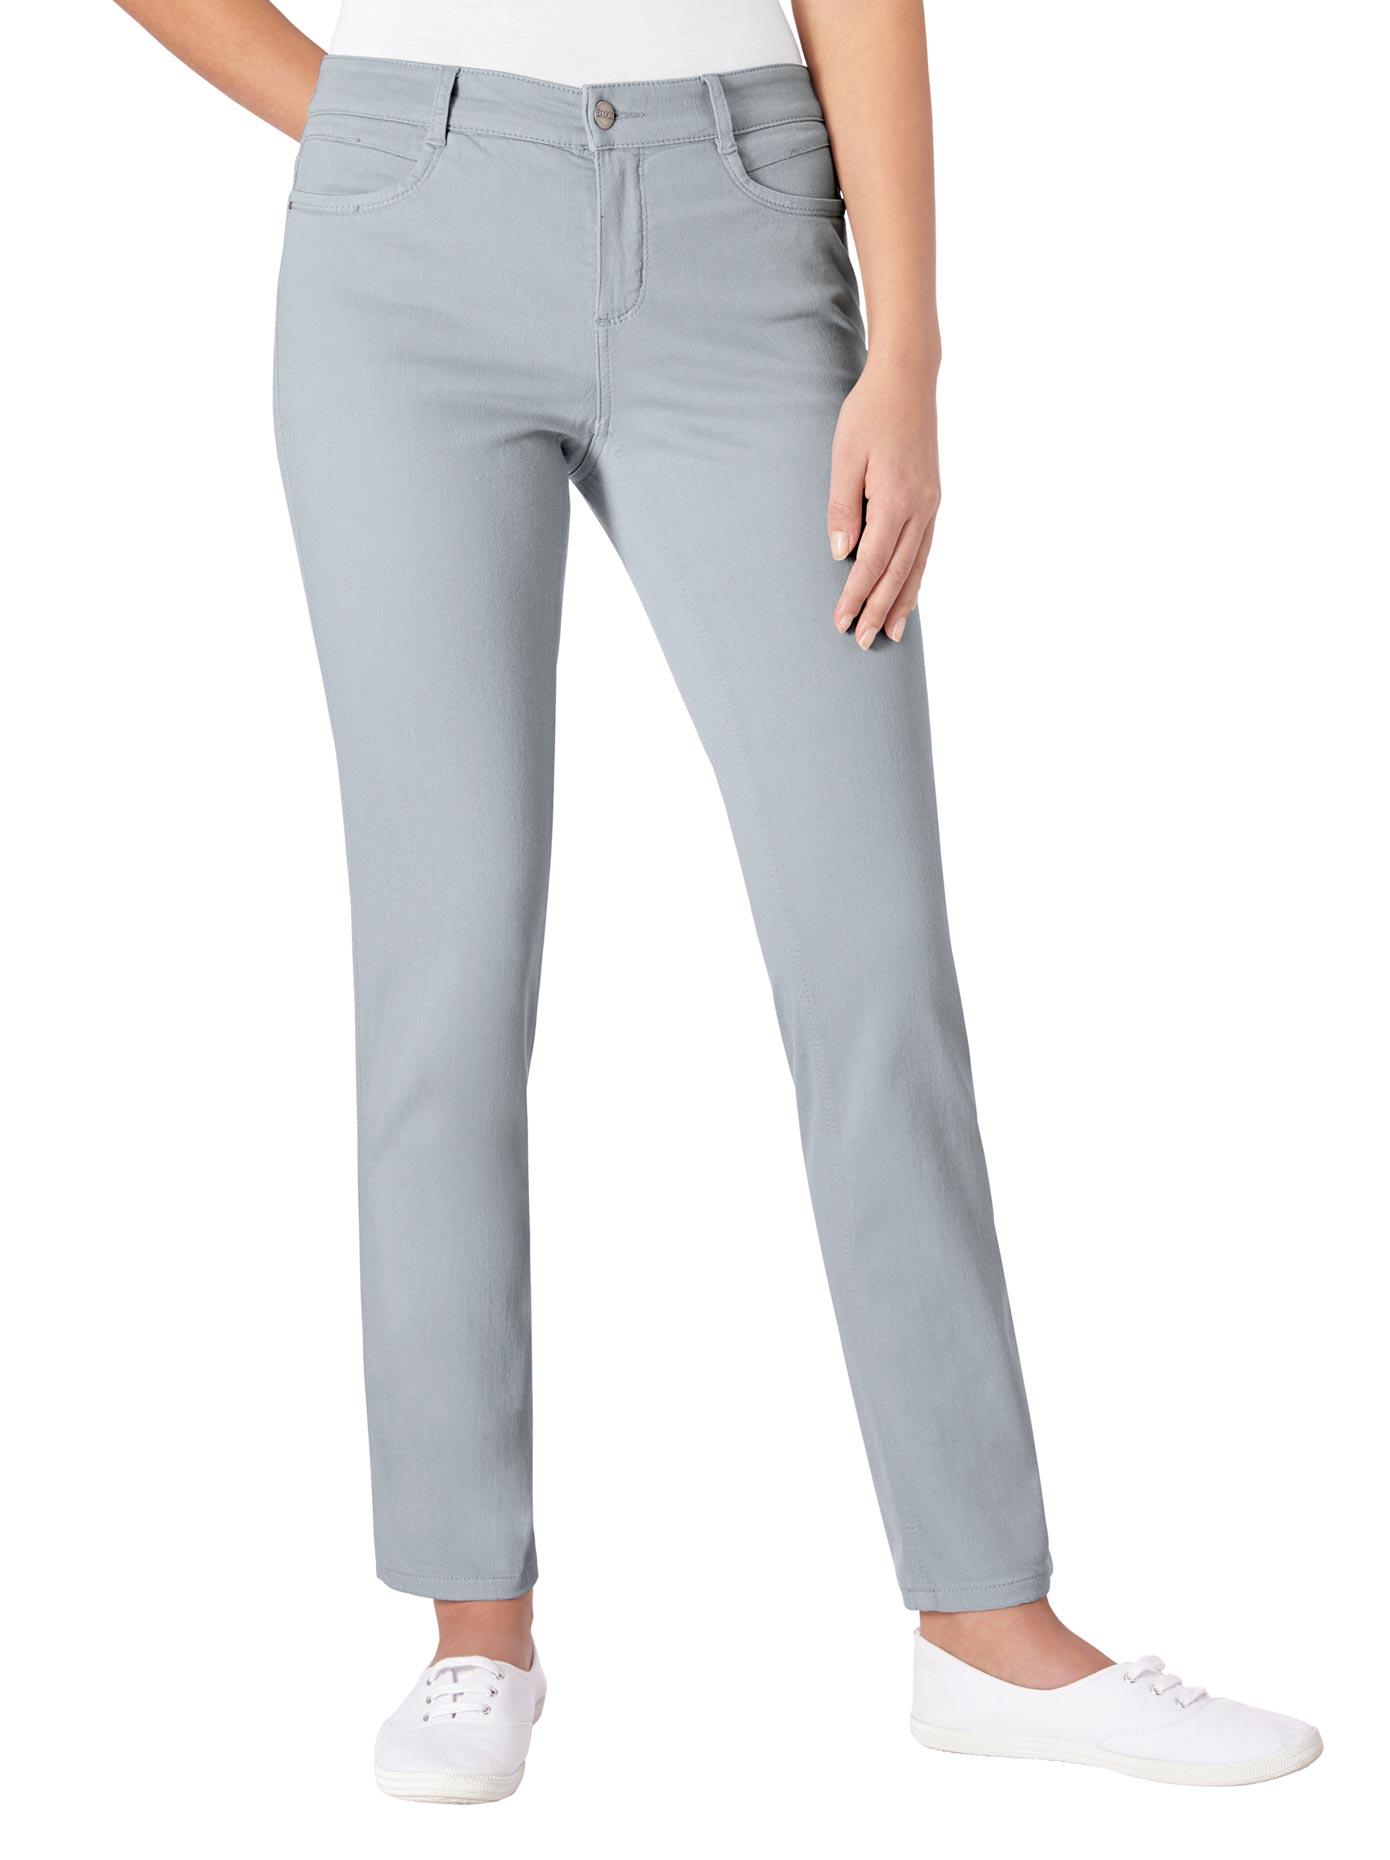 Image of Ascari Jeans super bequem